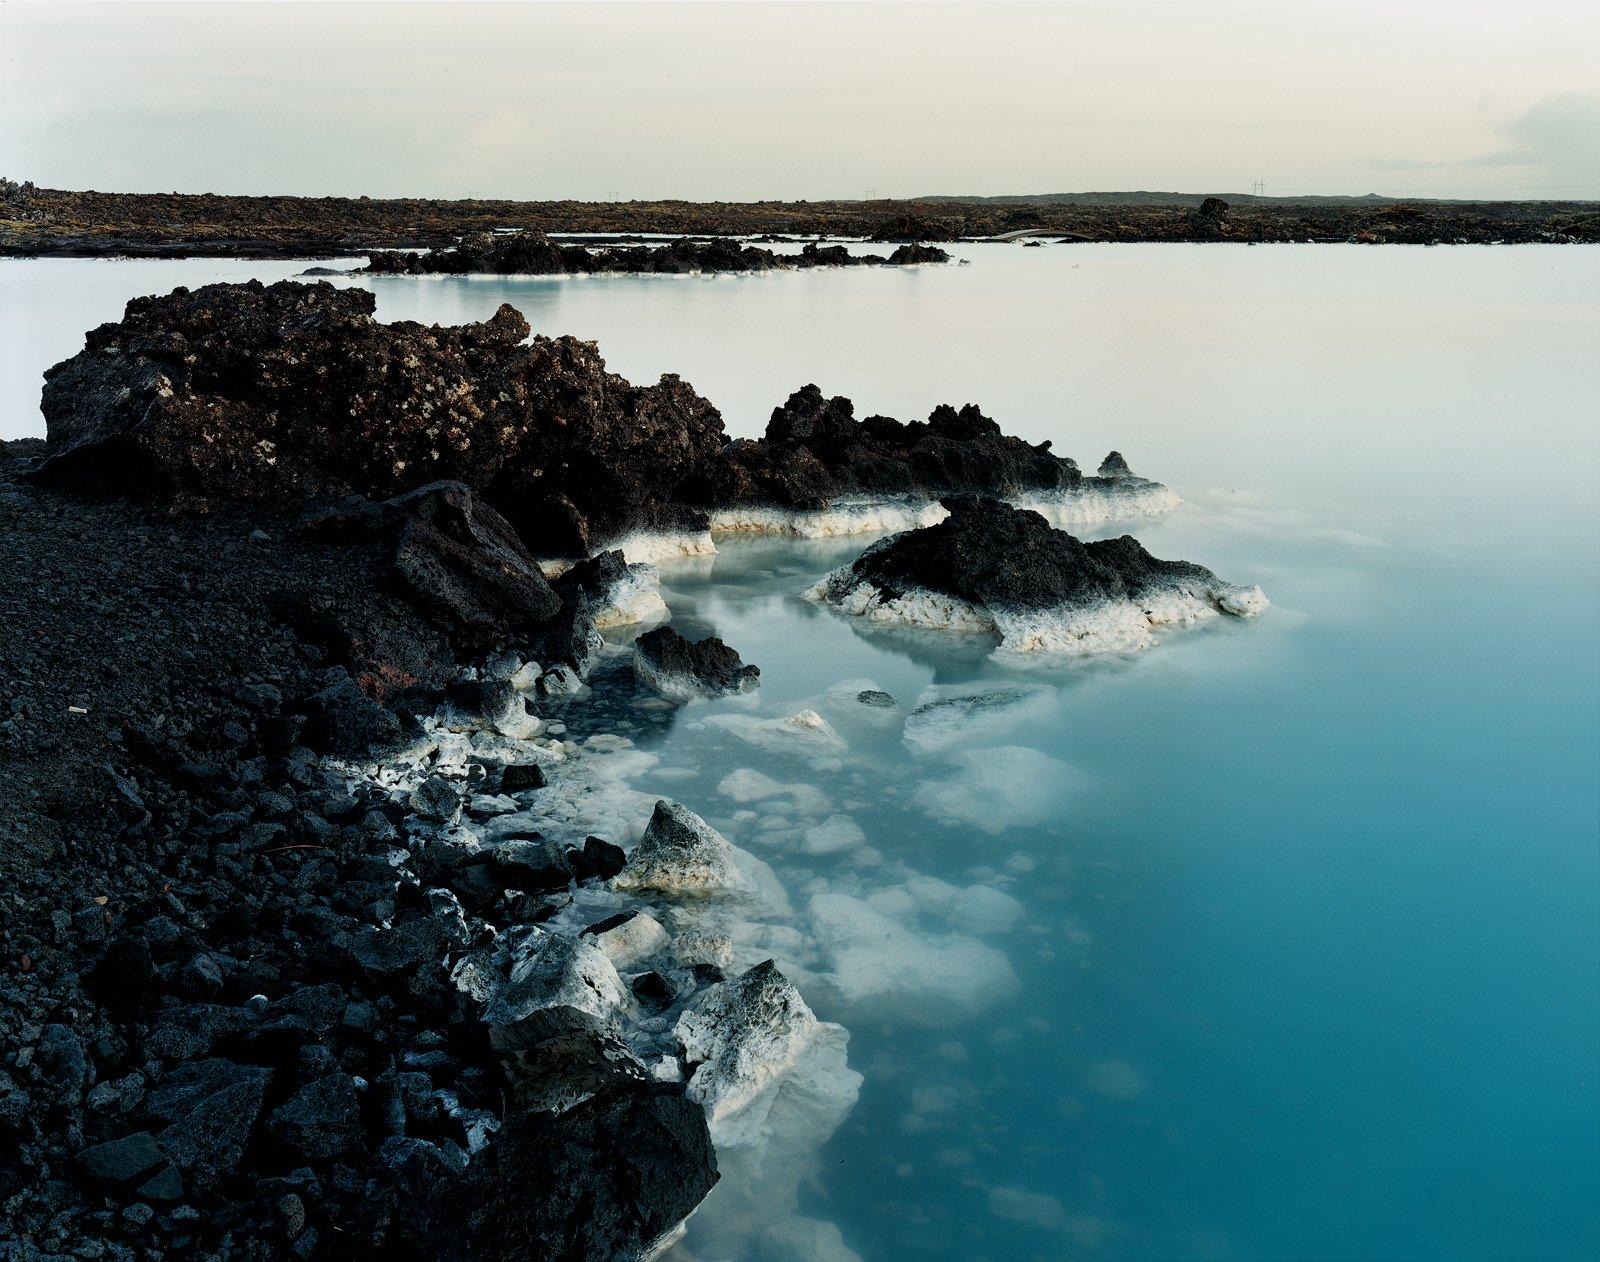 Articles about iceland photo portfolio meg wachter on Dwell.com